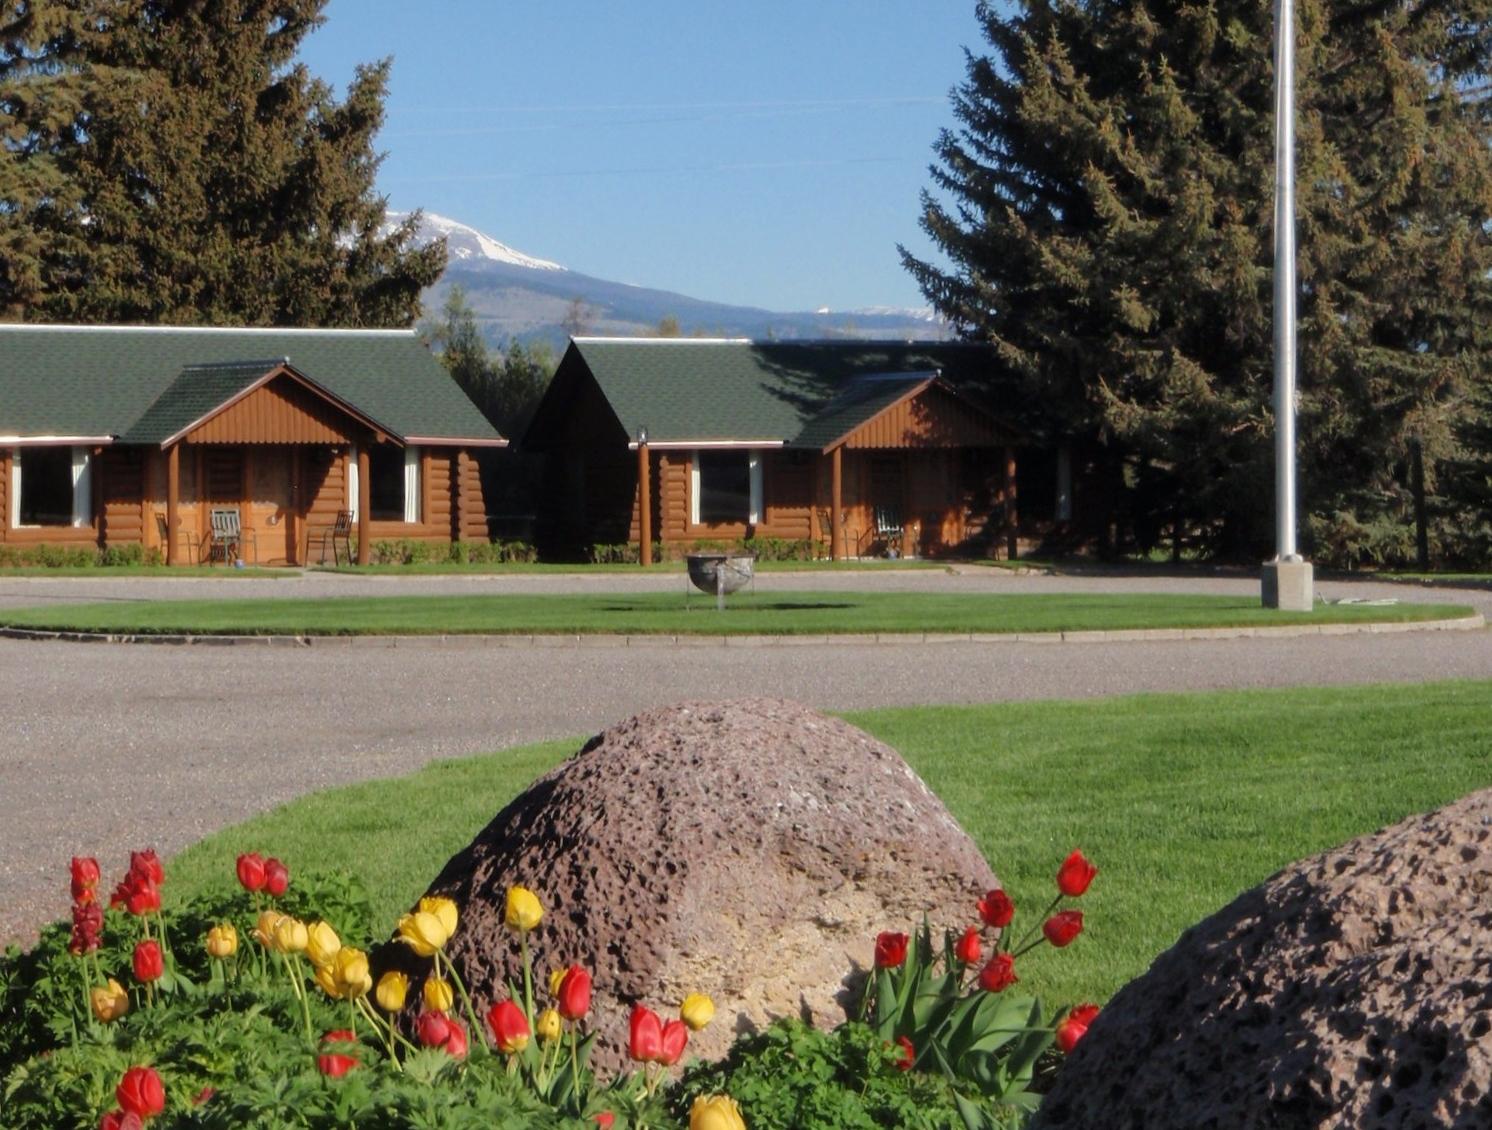 El Western Cabins Lodges